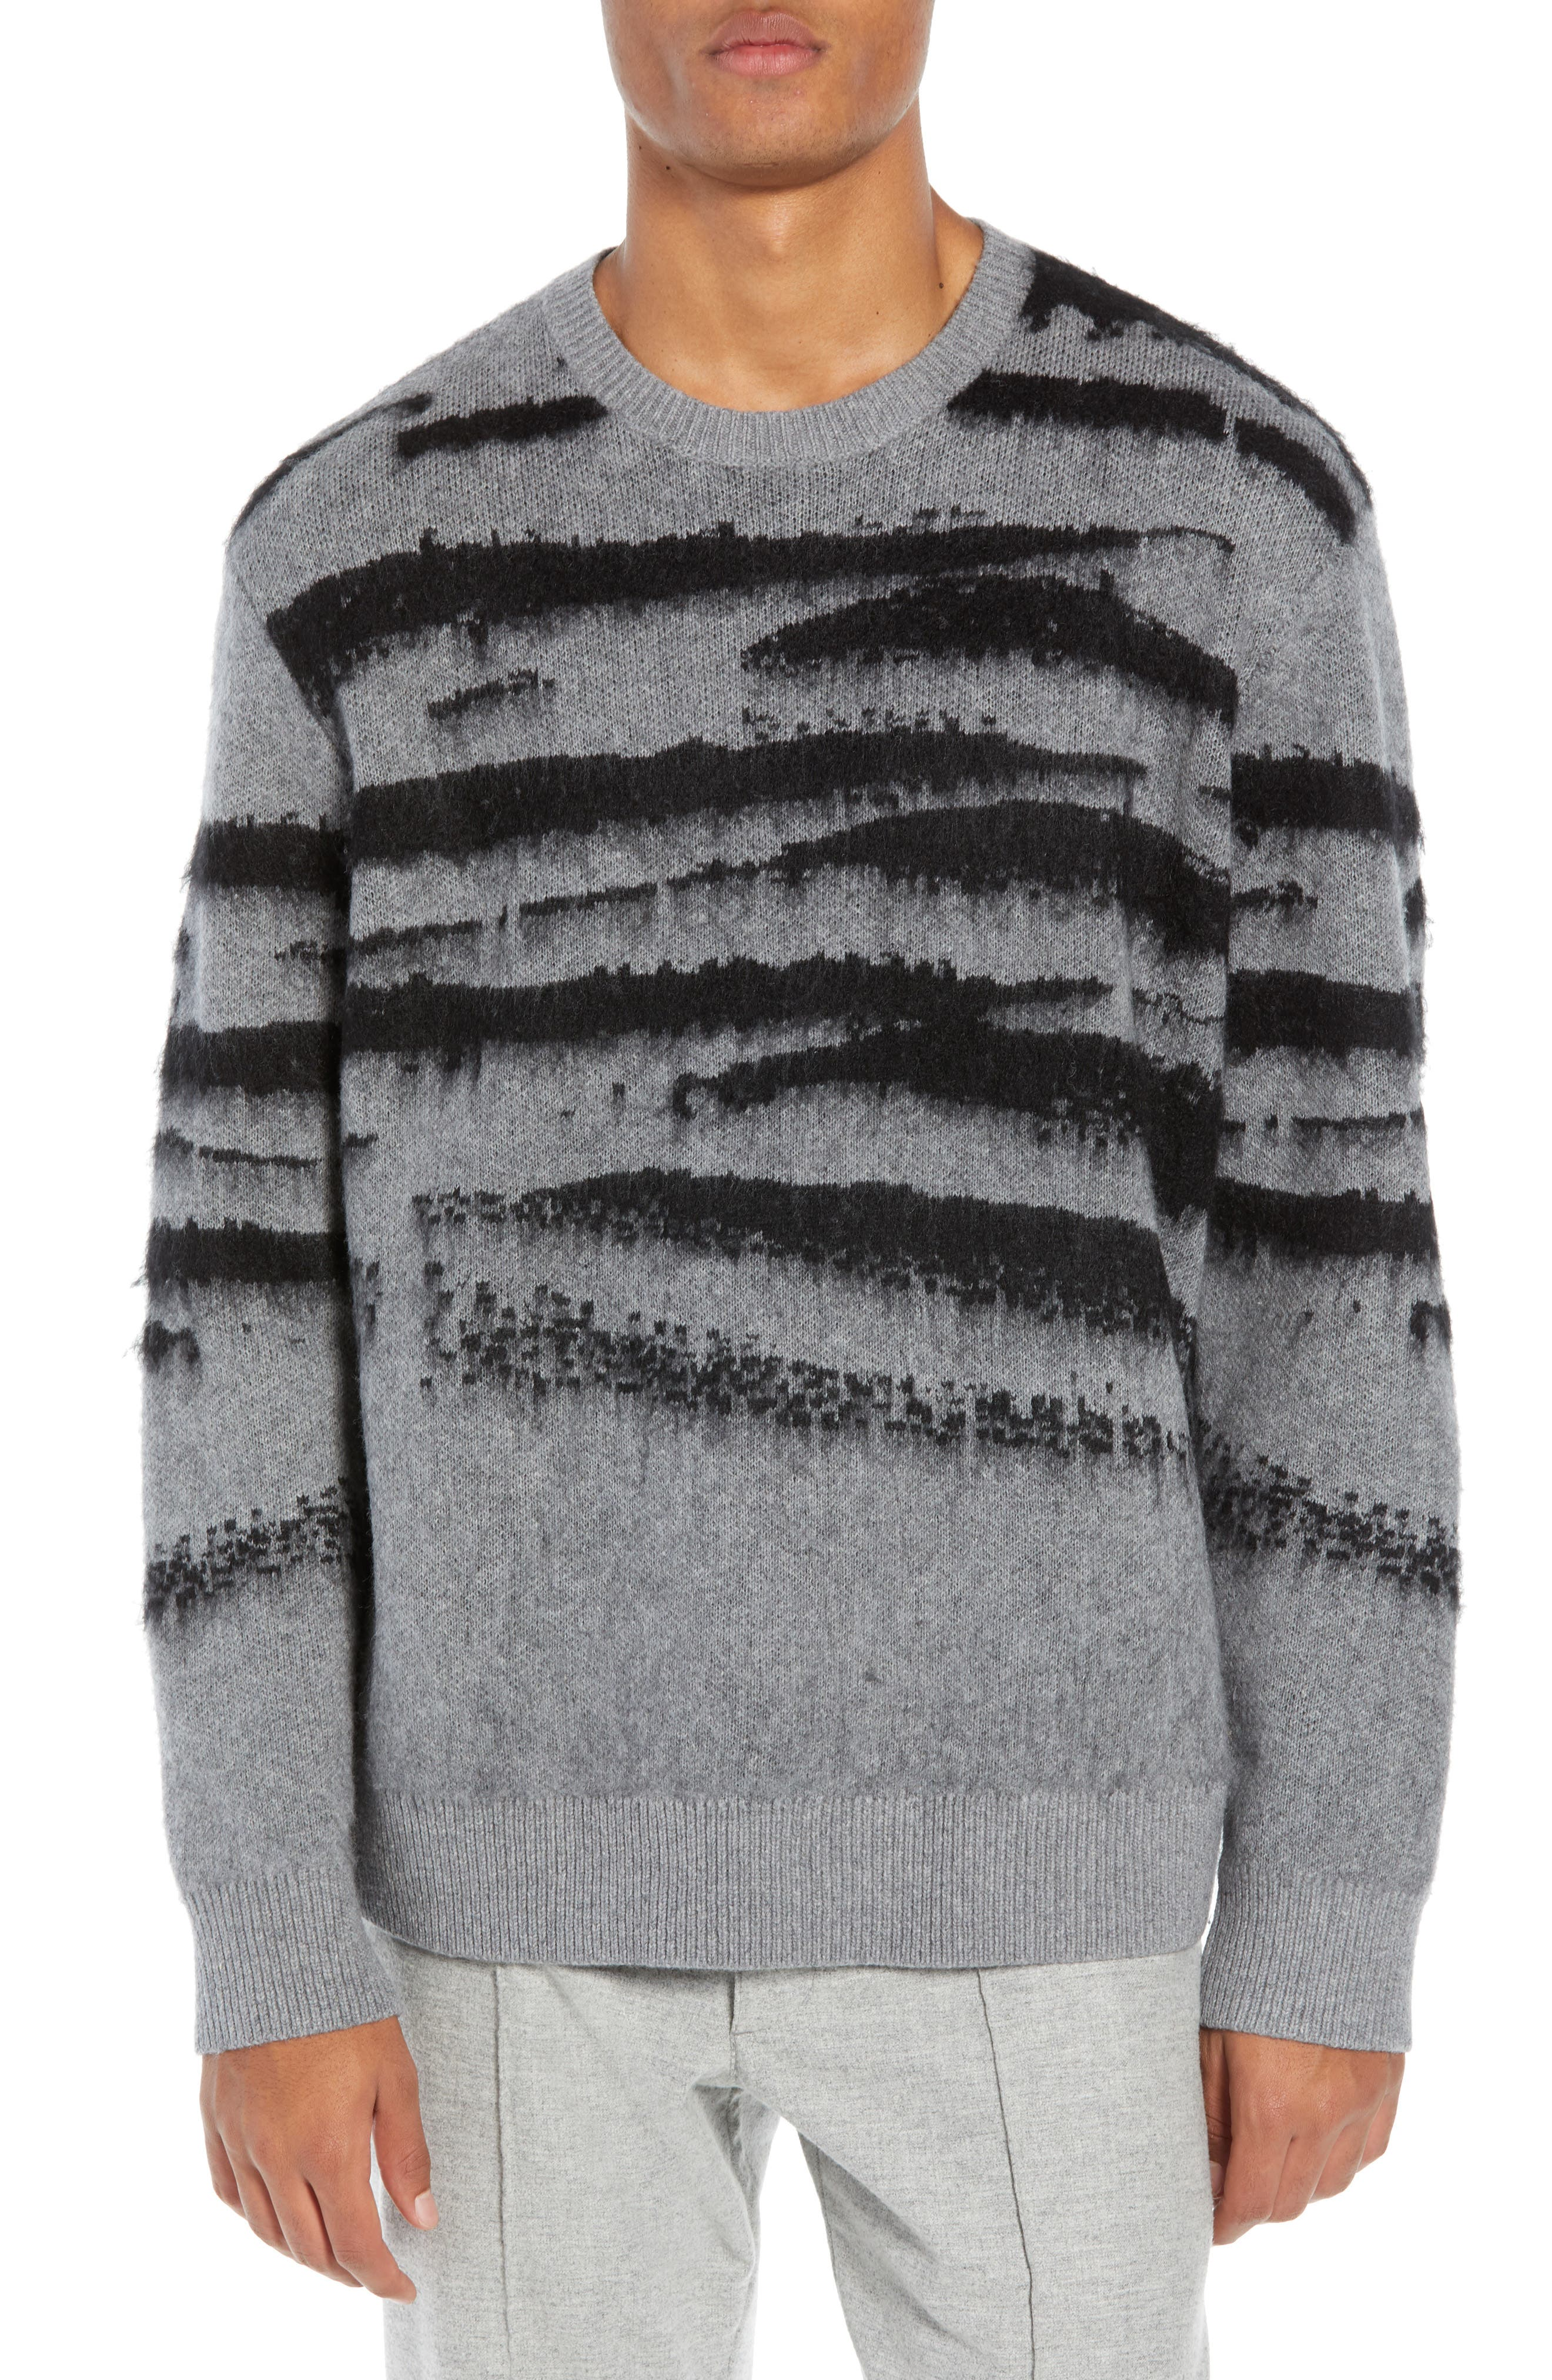 Ture Regular Fit Sweater,                             Main thumbnail 1, color,                             GREY/ CINDER